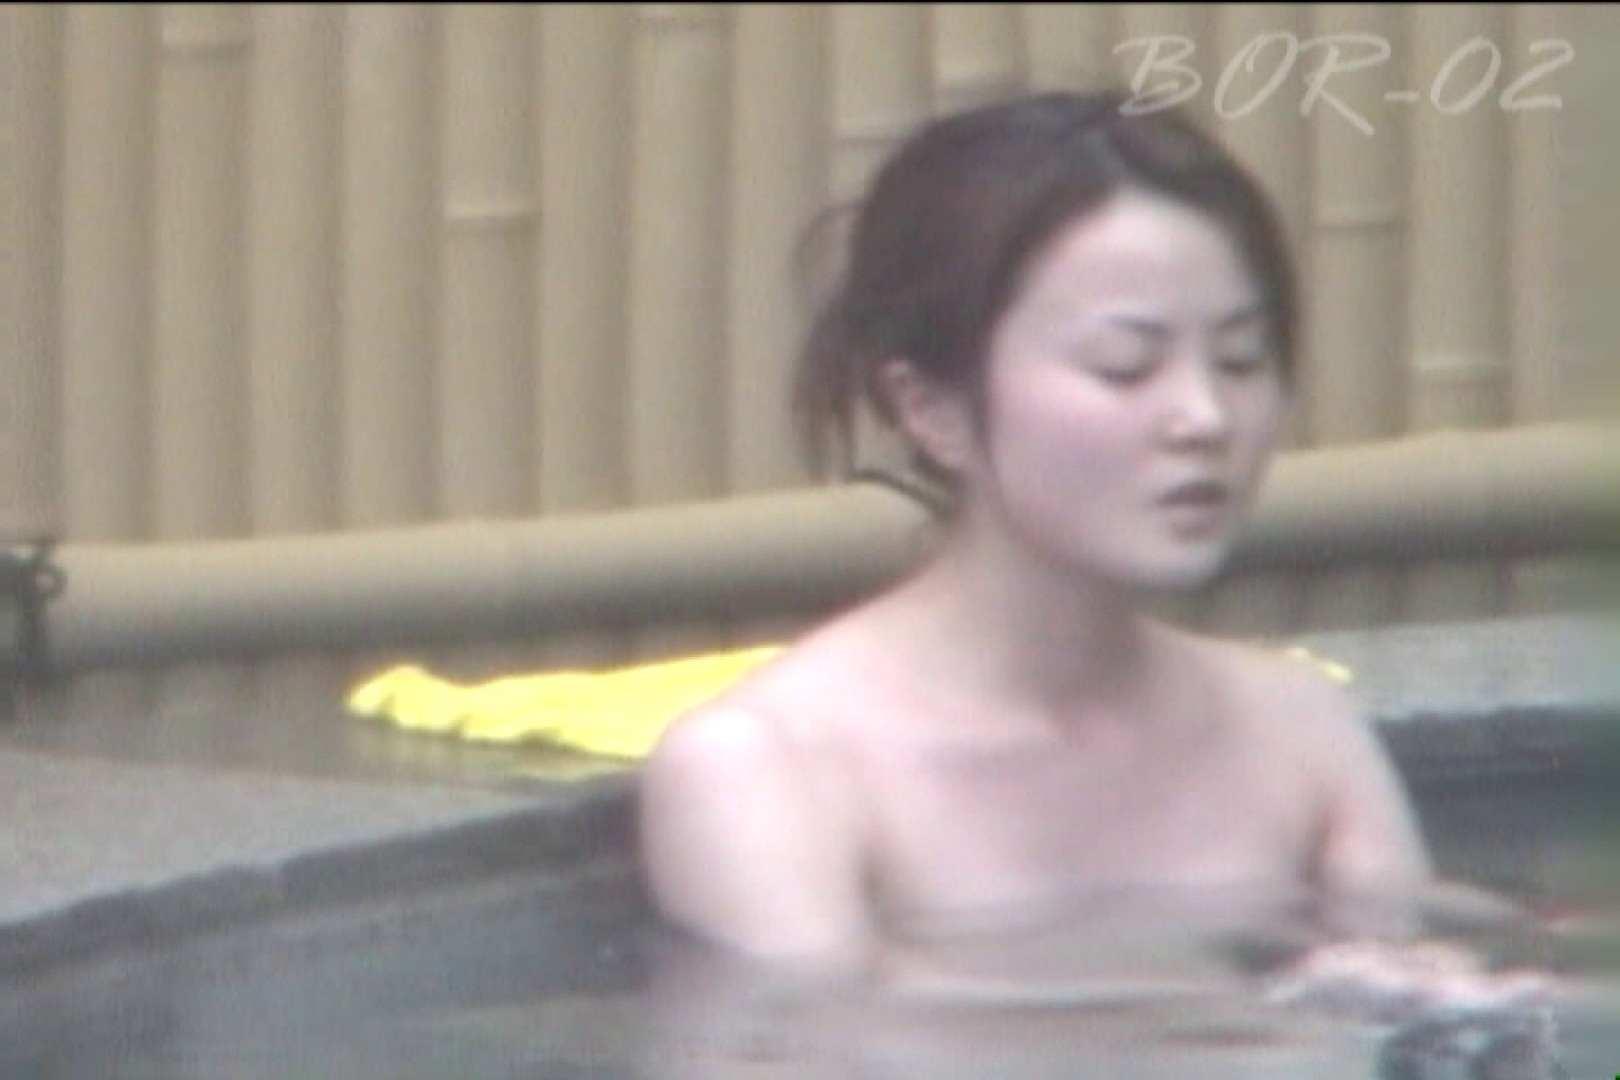 Aquaな露天風呂Vol.474 美しいOLの裸体 | 露天風呂突入  84pic 64